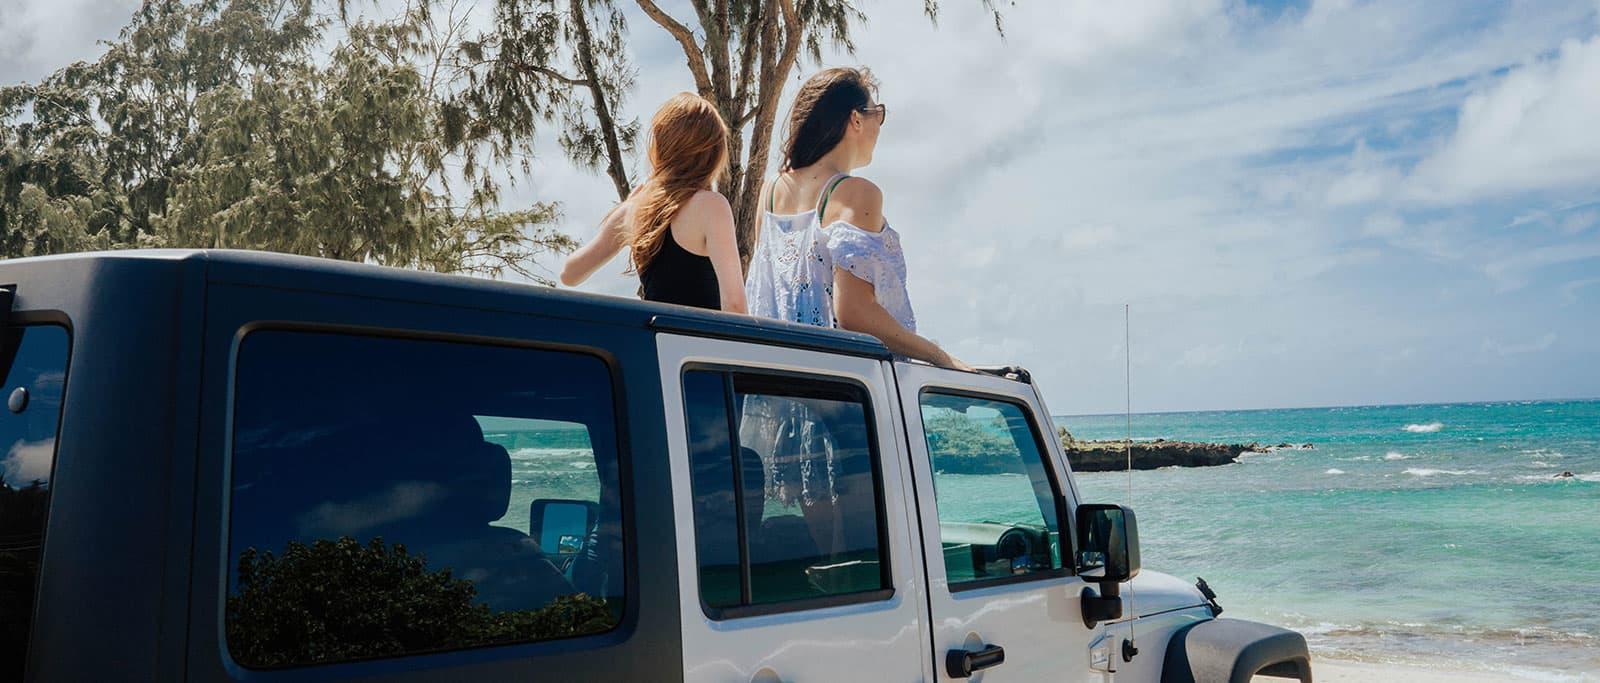 Waikiki Beachcomber by Outrigger, Honolulu Island Explorer